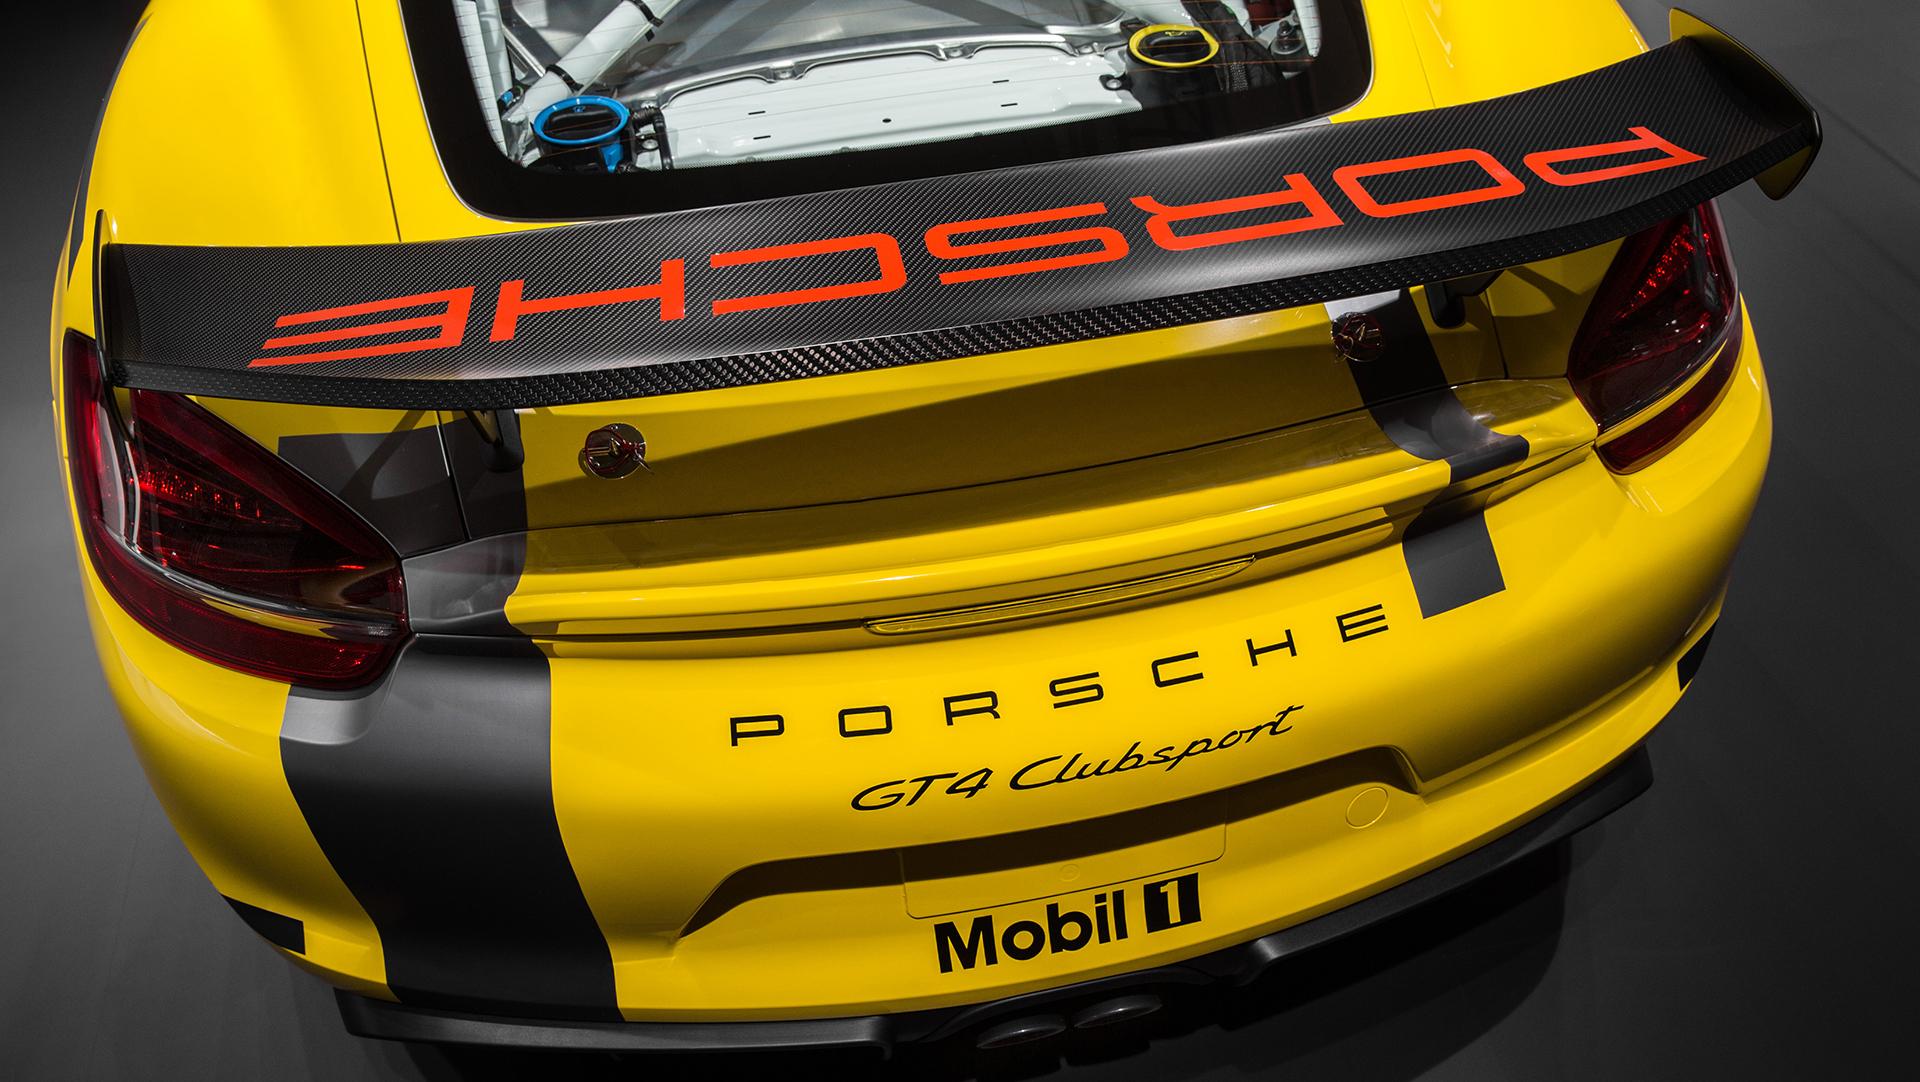 Porsche Cayman GT4 Clubsport - 2015 - zoom vue arrière / rear zoom view